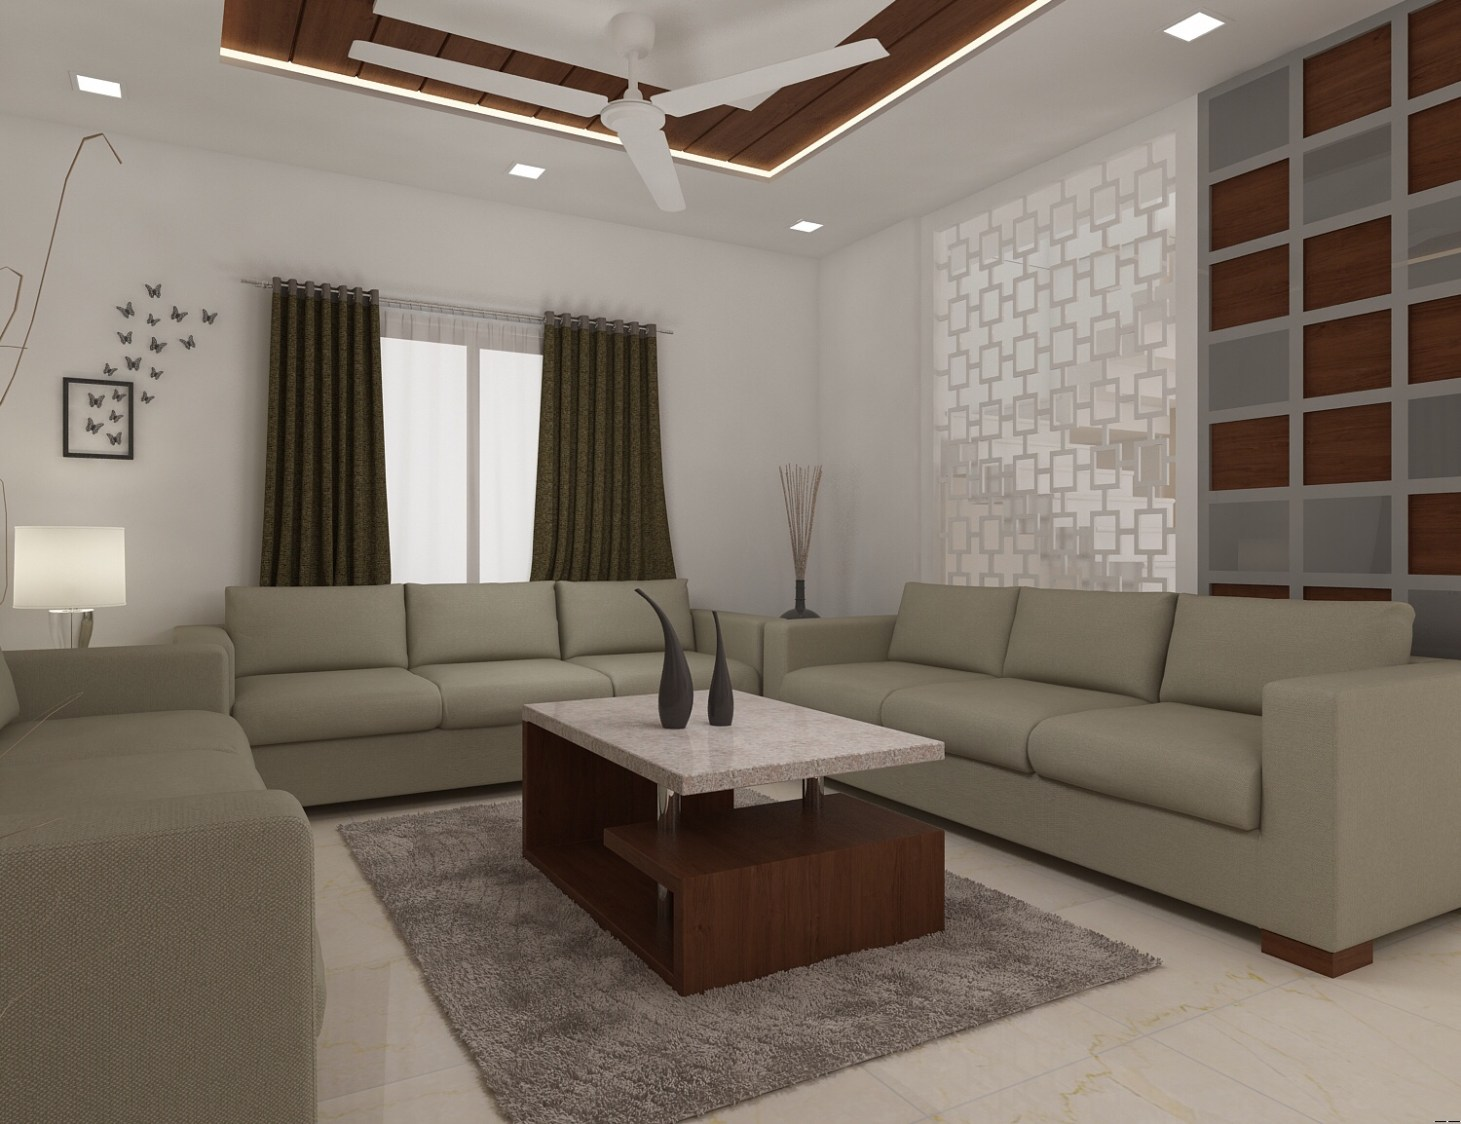 Contemporary living room with rustic shades by setu.patel Living-room | Interior Design Photos & Ideas